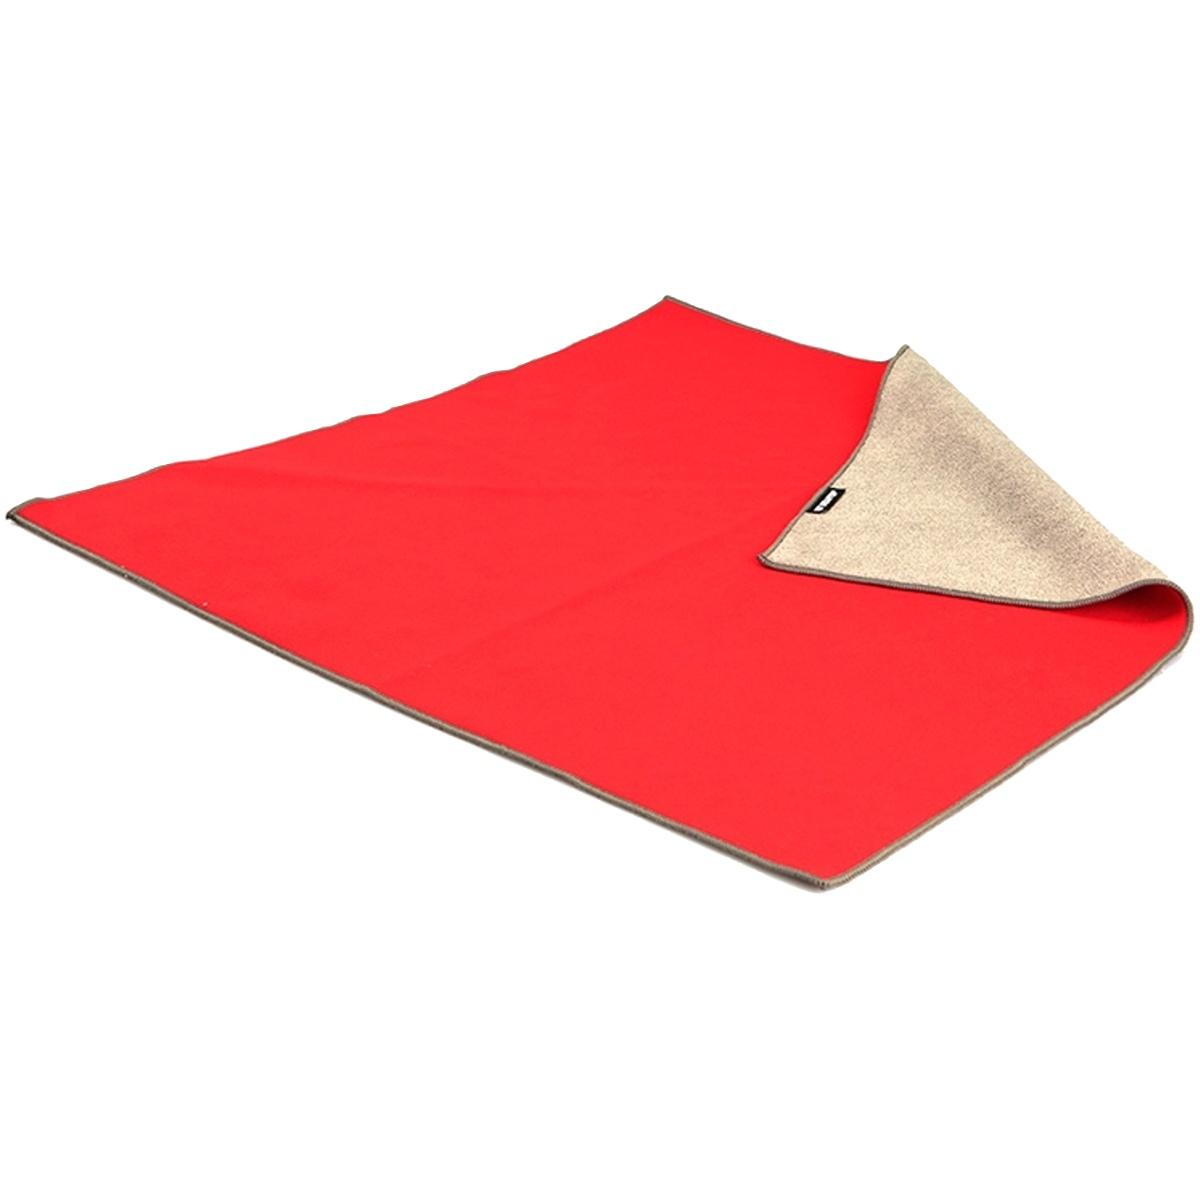 Einschlagtuch Easy Wrapper (L) Rot